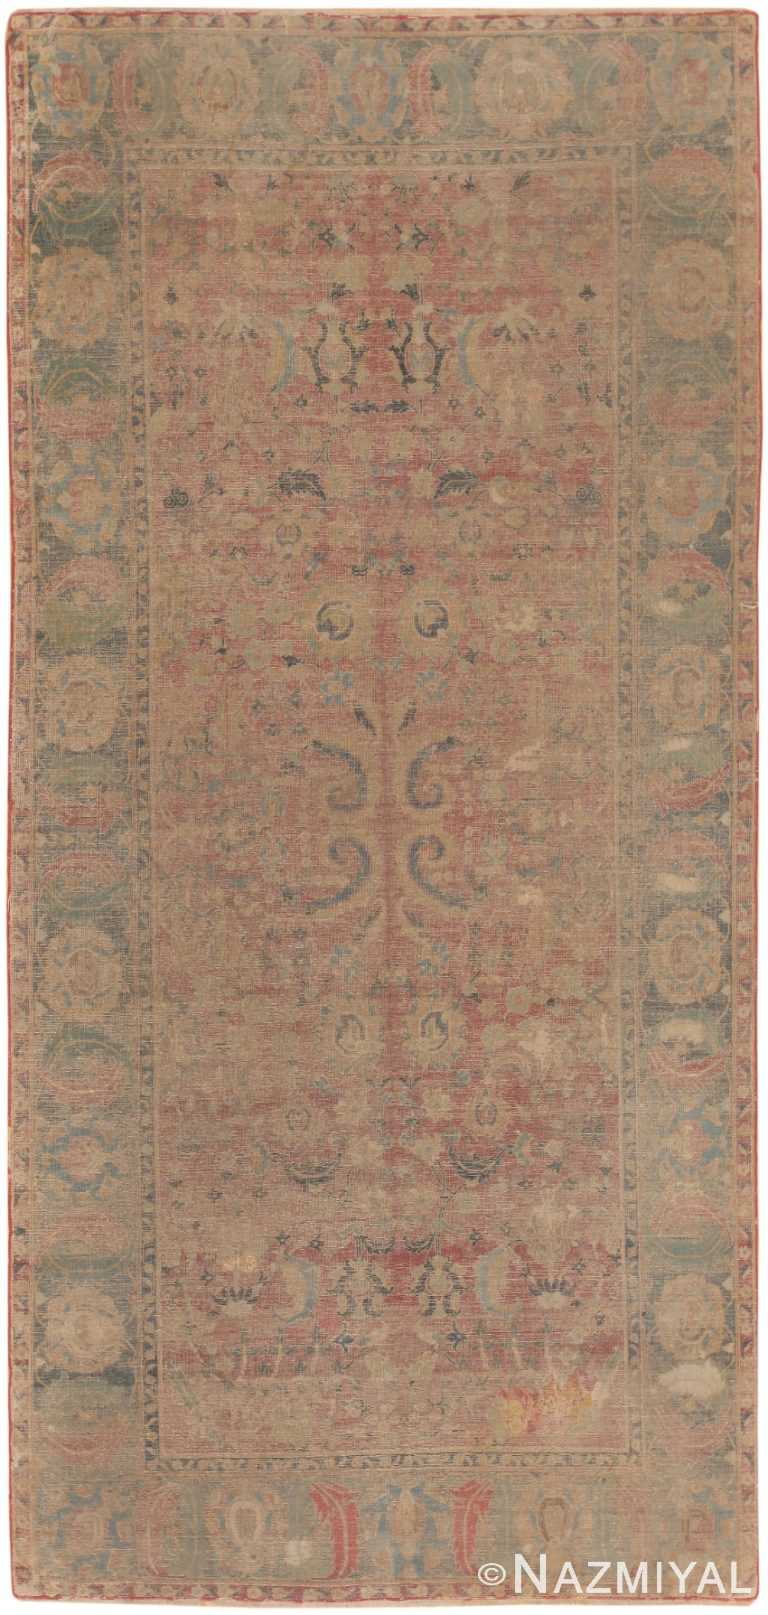 Seventeenth Century Esfahan Persian Rug 47080 Large Image